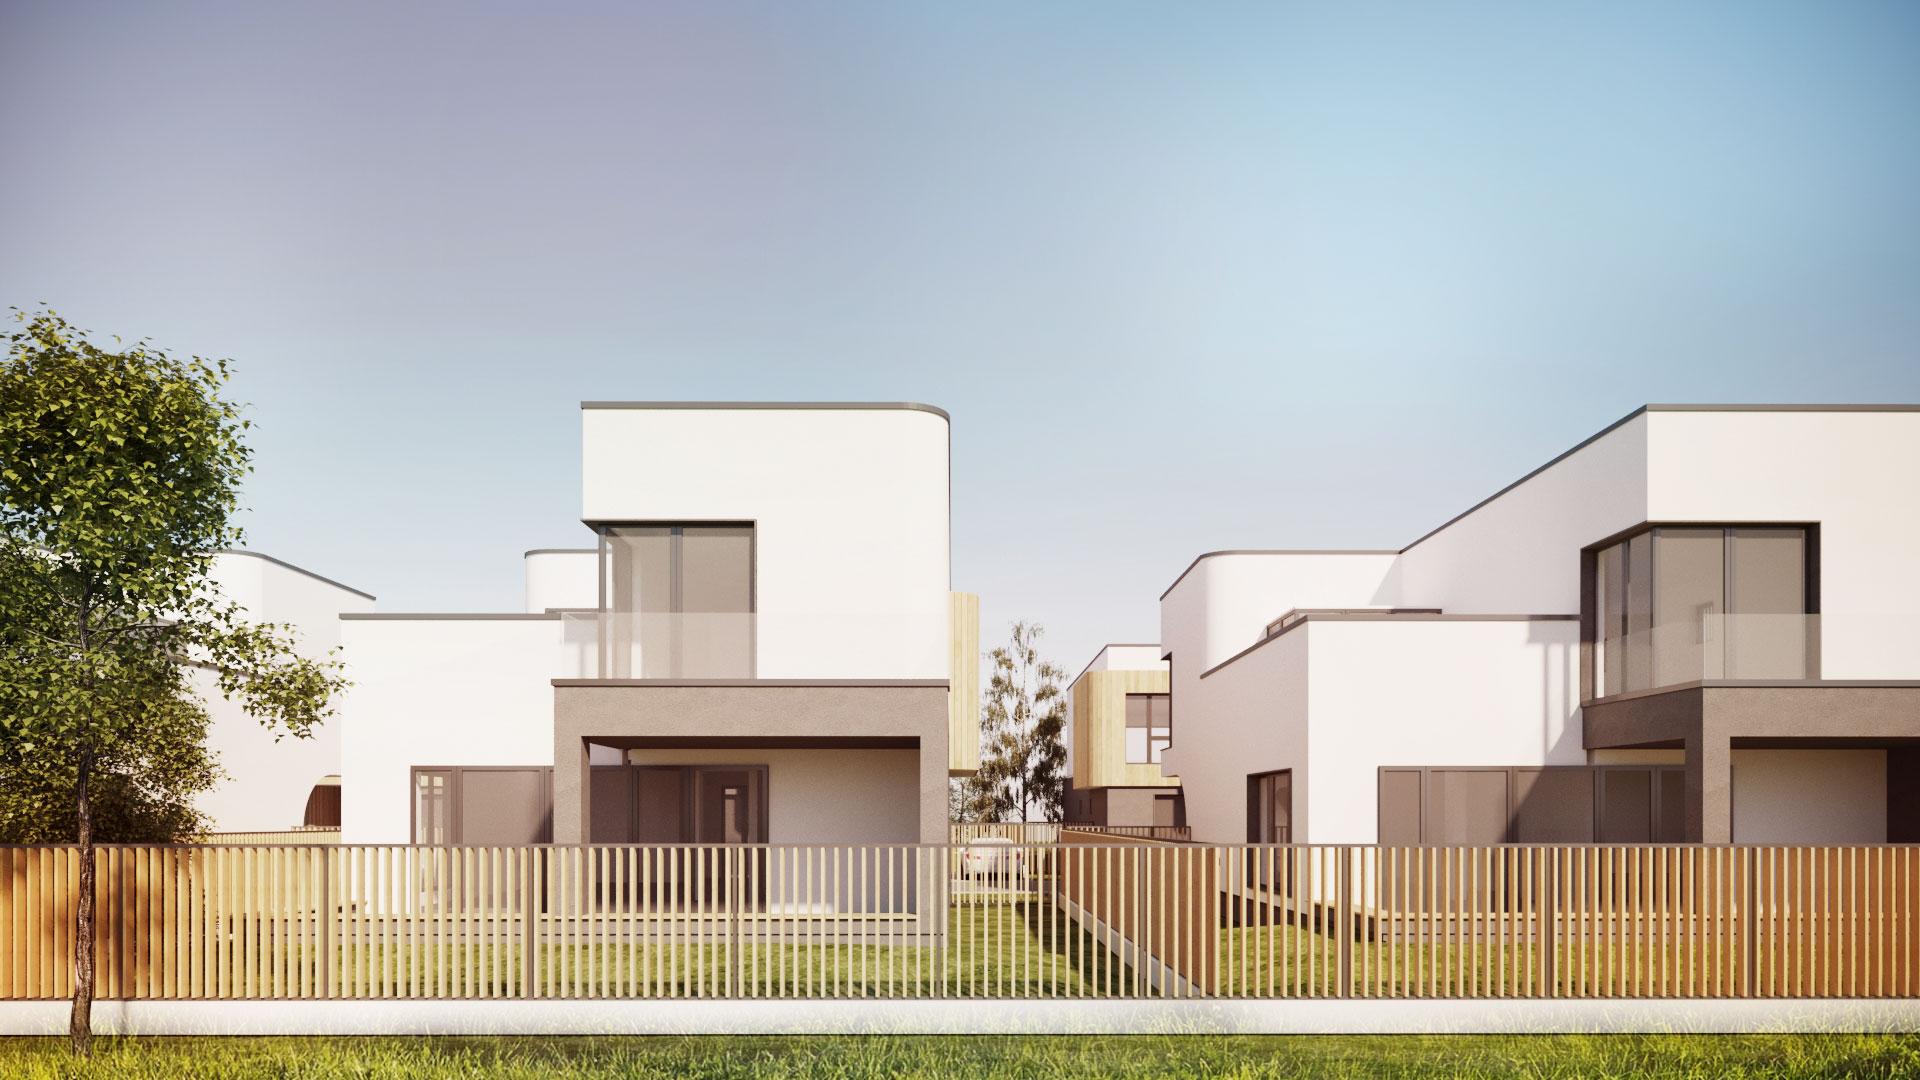 https://nbc-arhitect.ro/wp-content/uploads/2020/10/NBC-Arhitect-_-residential-_-Grand-Home-Residence-_-Romania_1.jpg